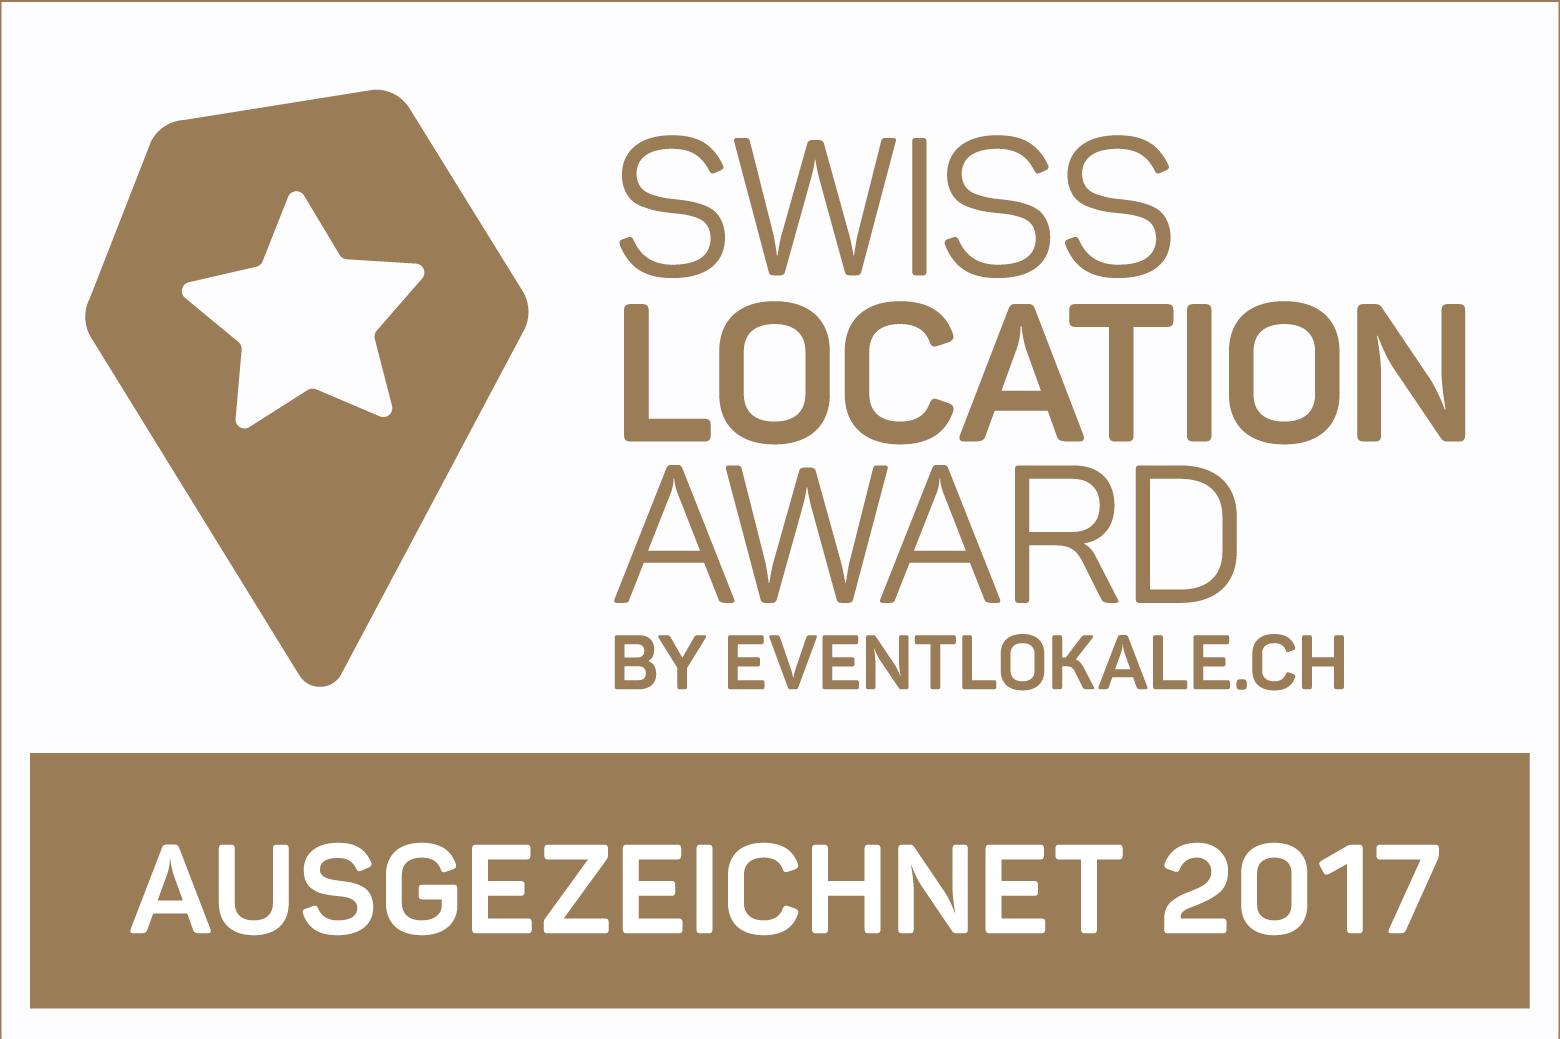 Swiss Location Award 2017.png